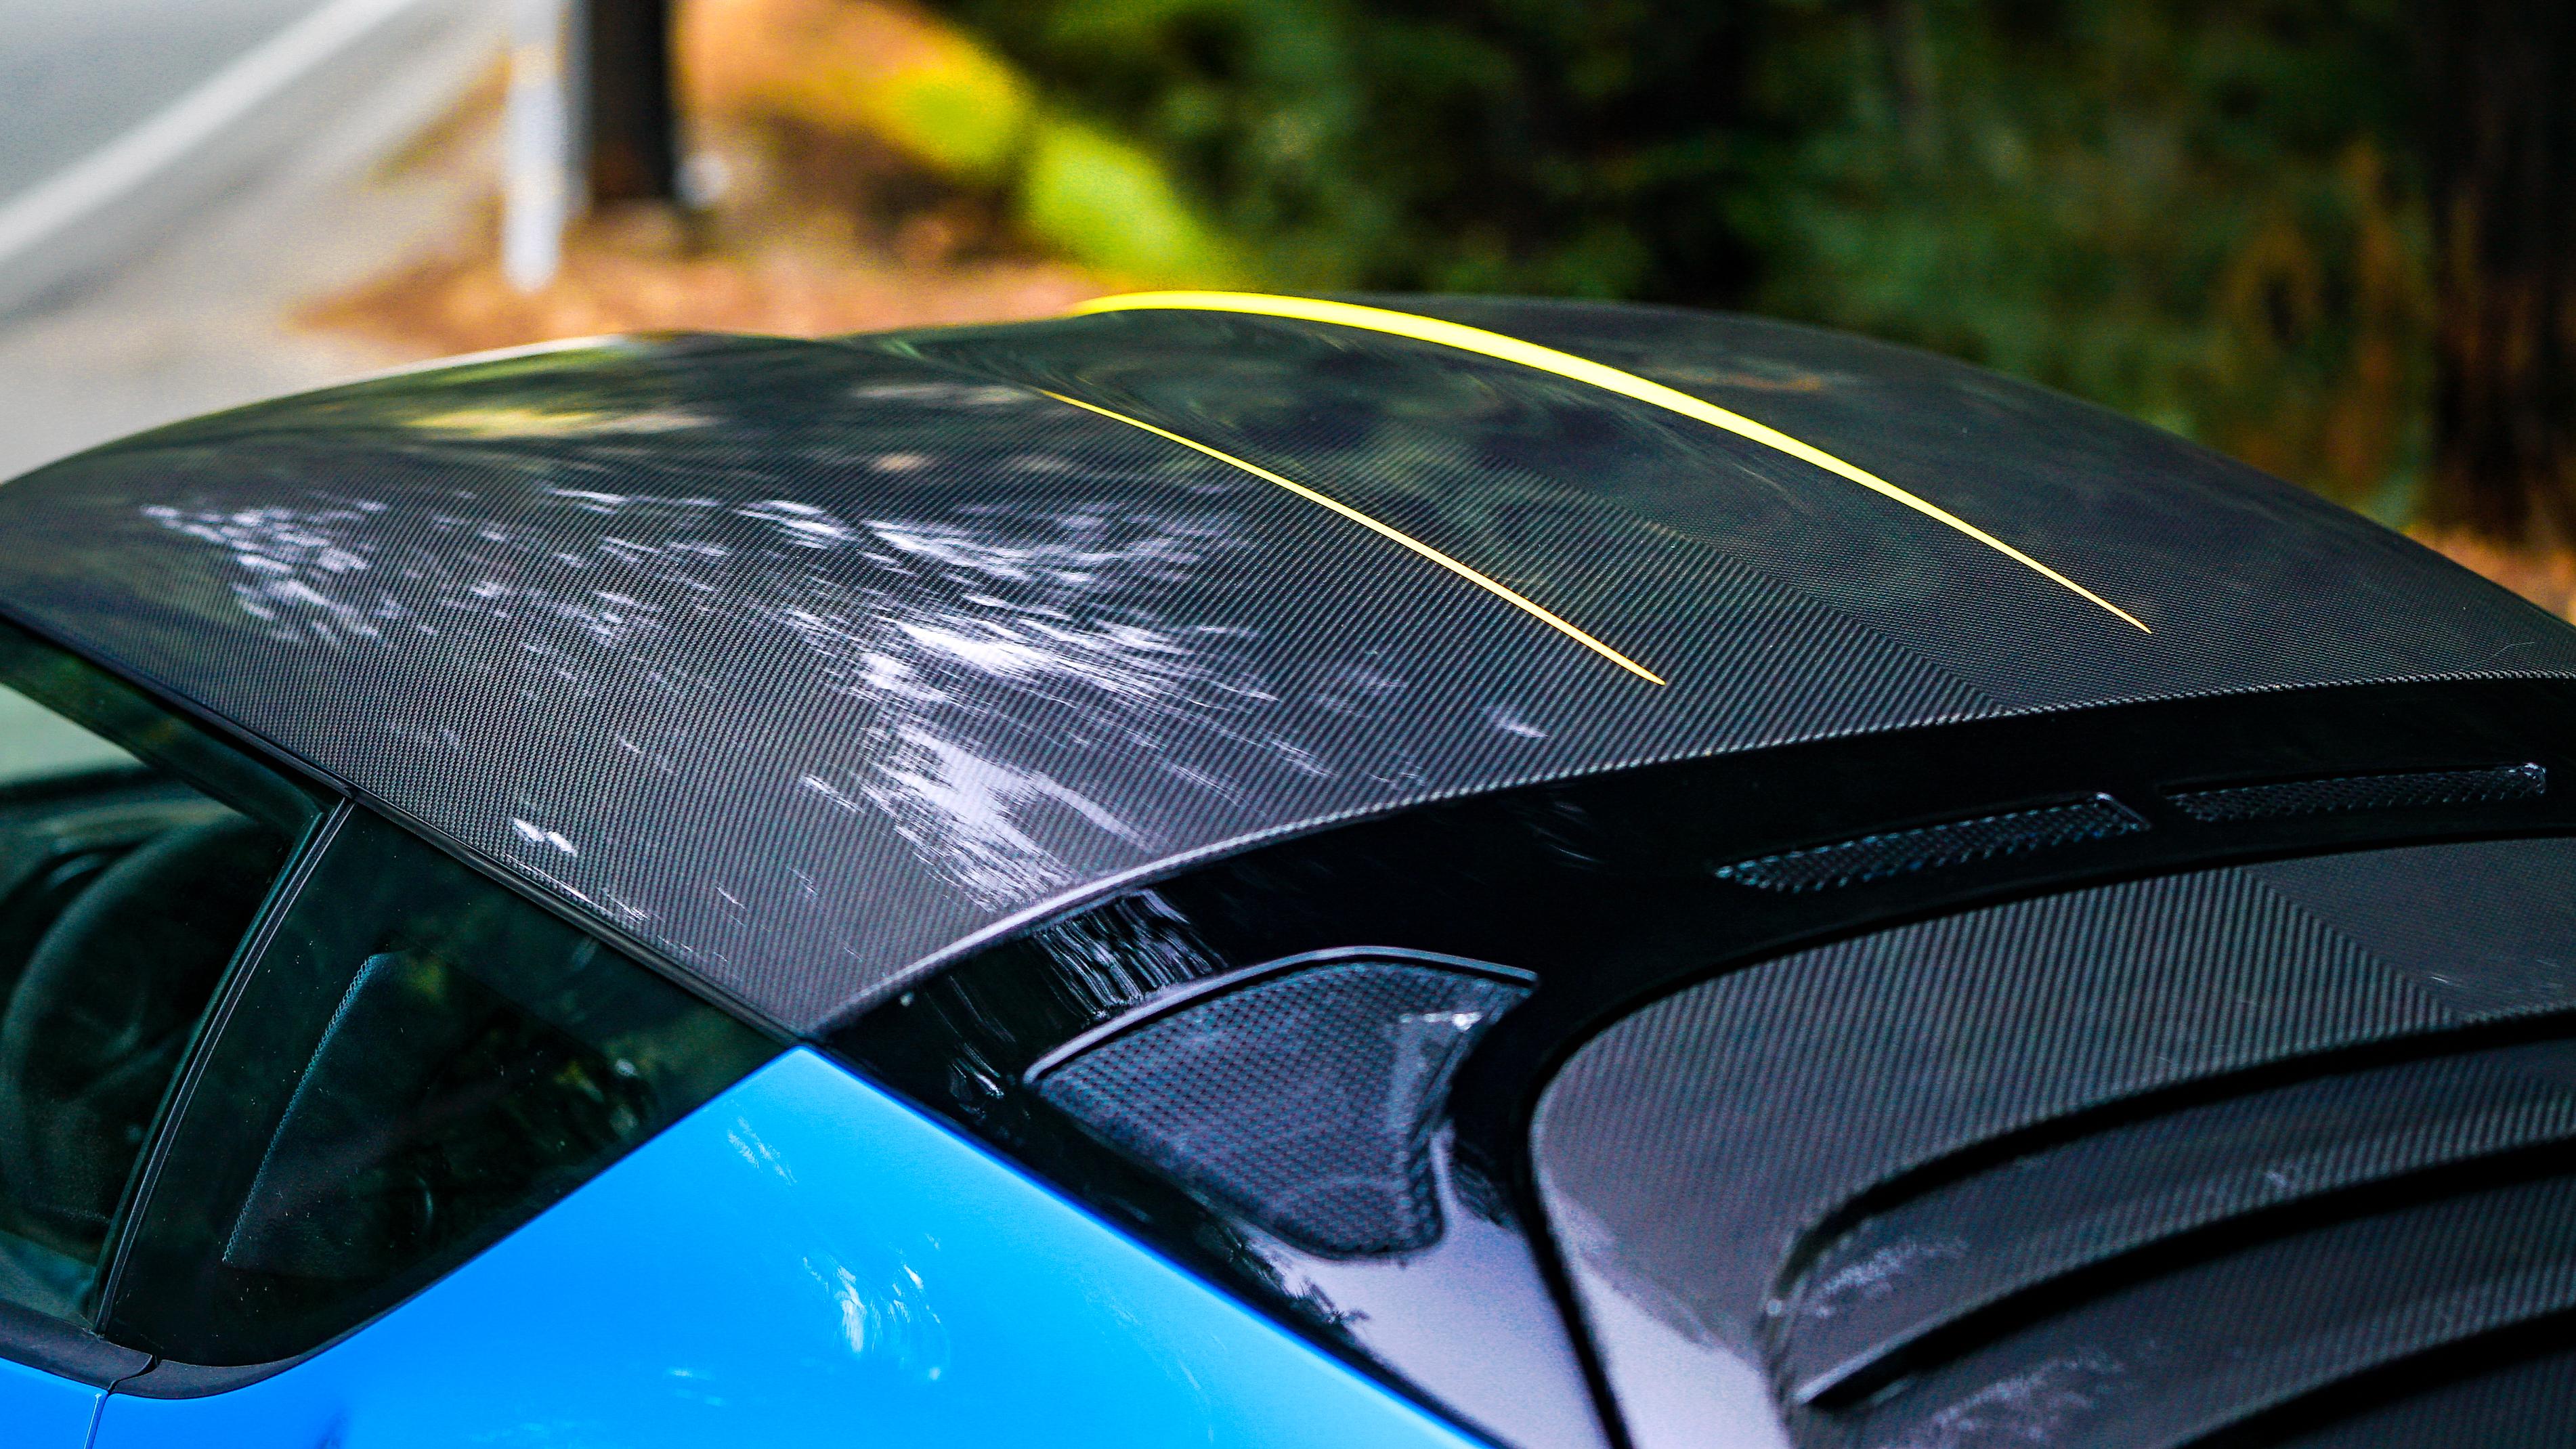 Lotus Evora GT, 2020 Lotus Evora GT is quick, light and instills confidence, ClassicCars.com Journal